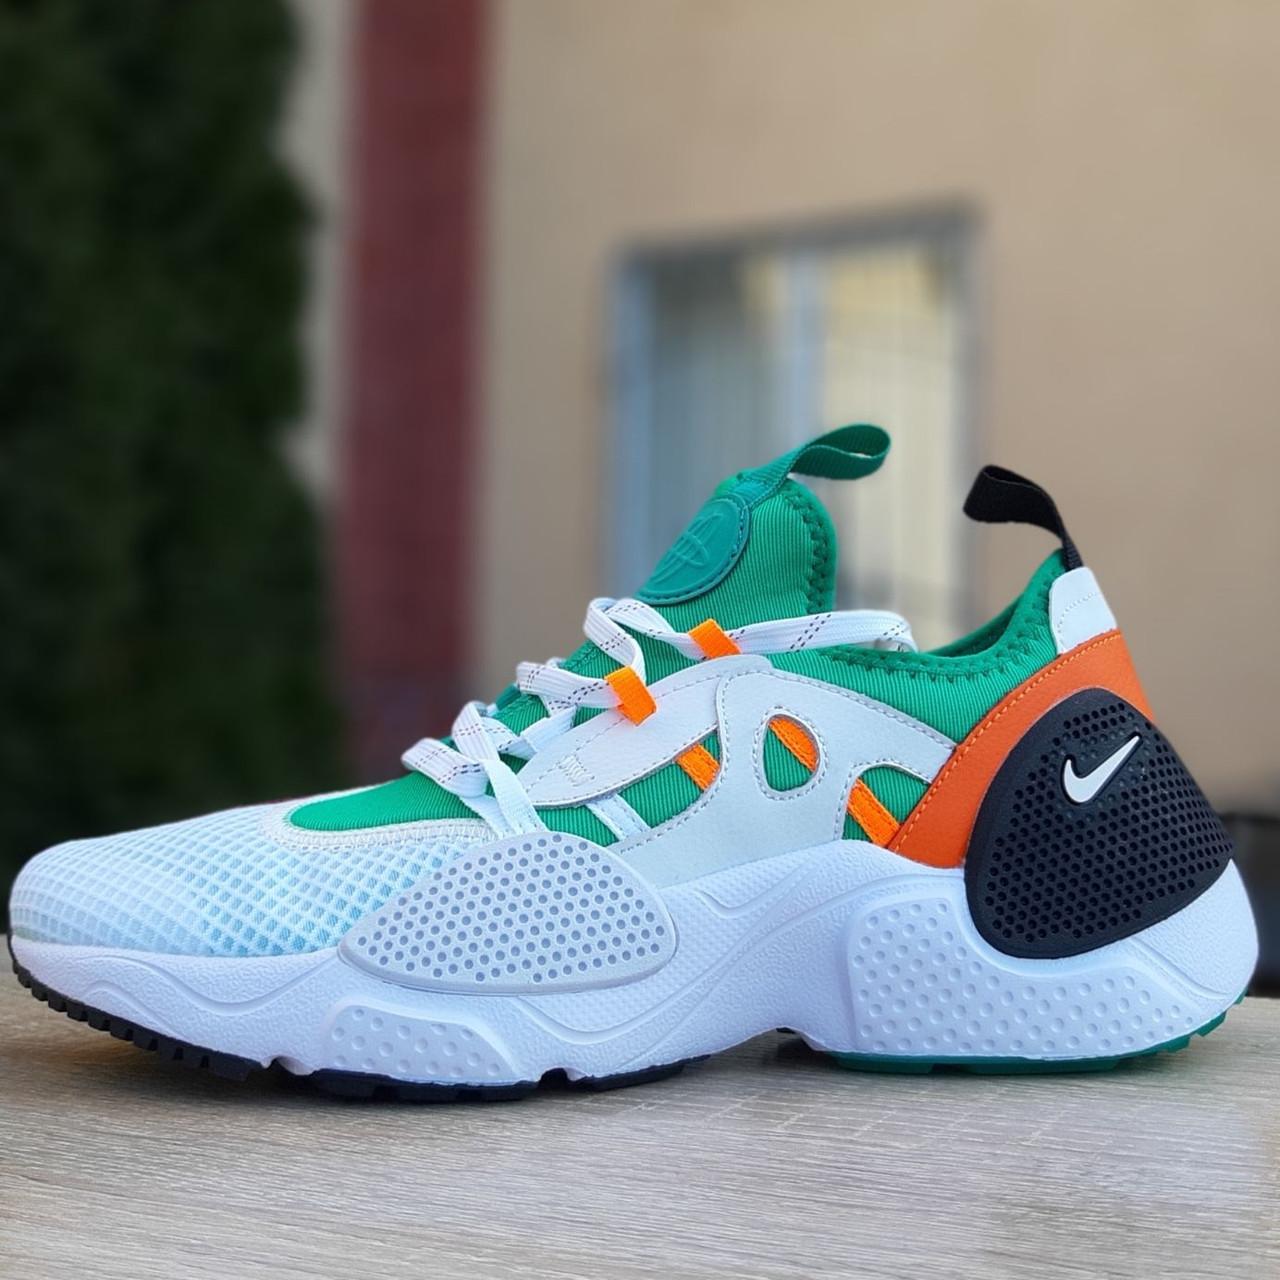 Кроссовки мужские Nike Huarache EDGE белые с зелёным (Top replic)